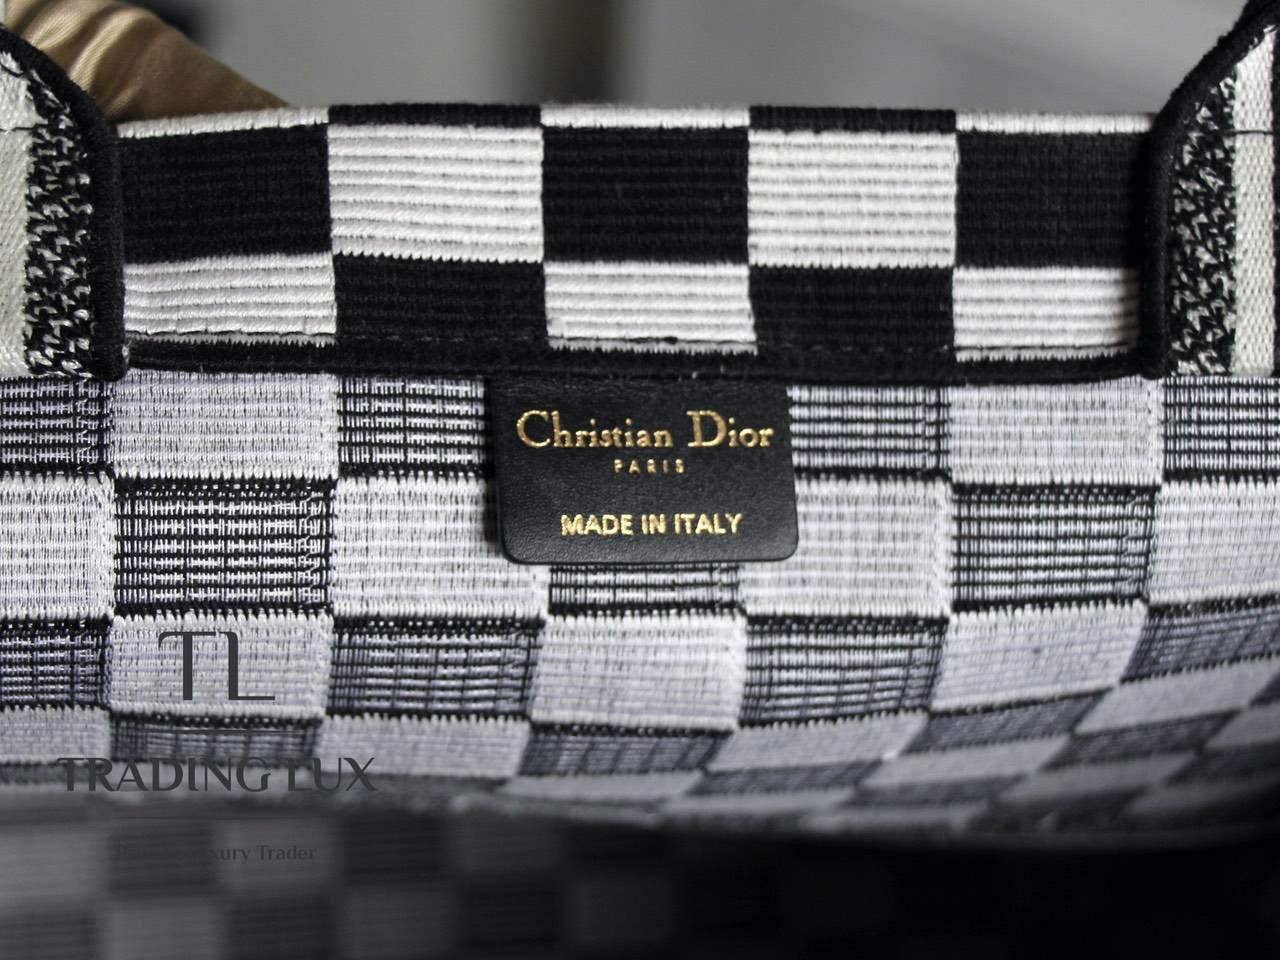 Dior-Book-Tote-Limited-Edition-8